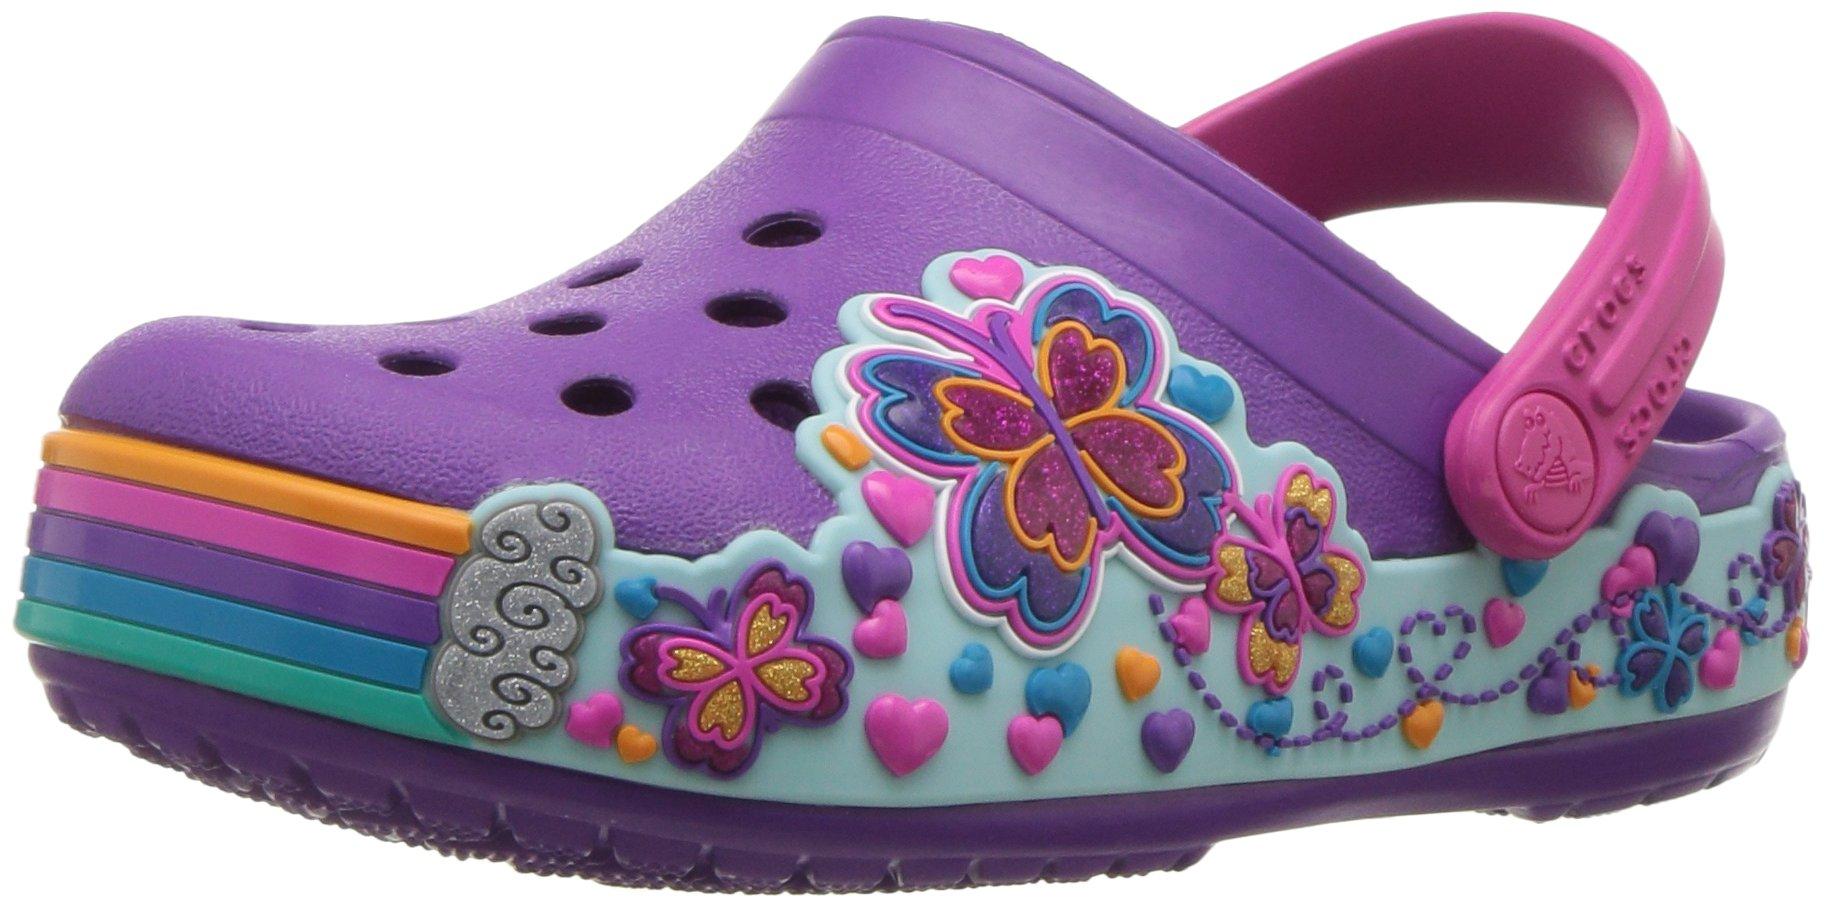 Crocs Crocband Fun Lab Graphic Light-Up Clog, Amethyst/Purple, 8 M US Toddler